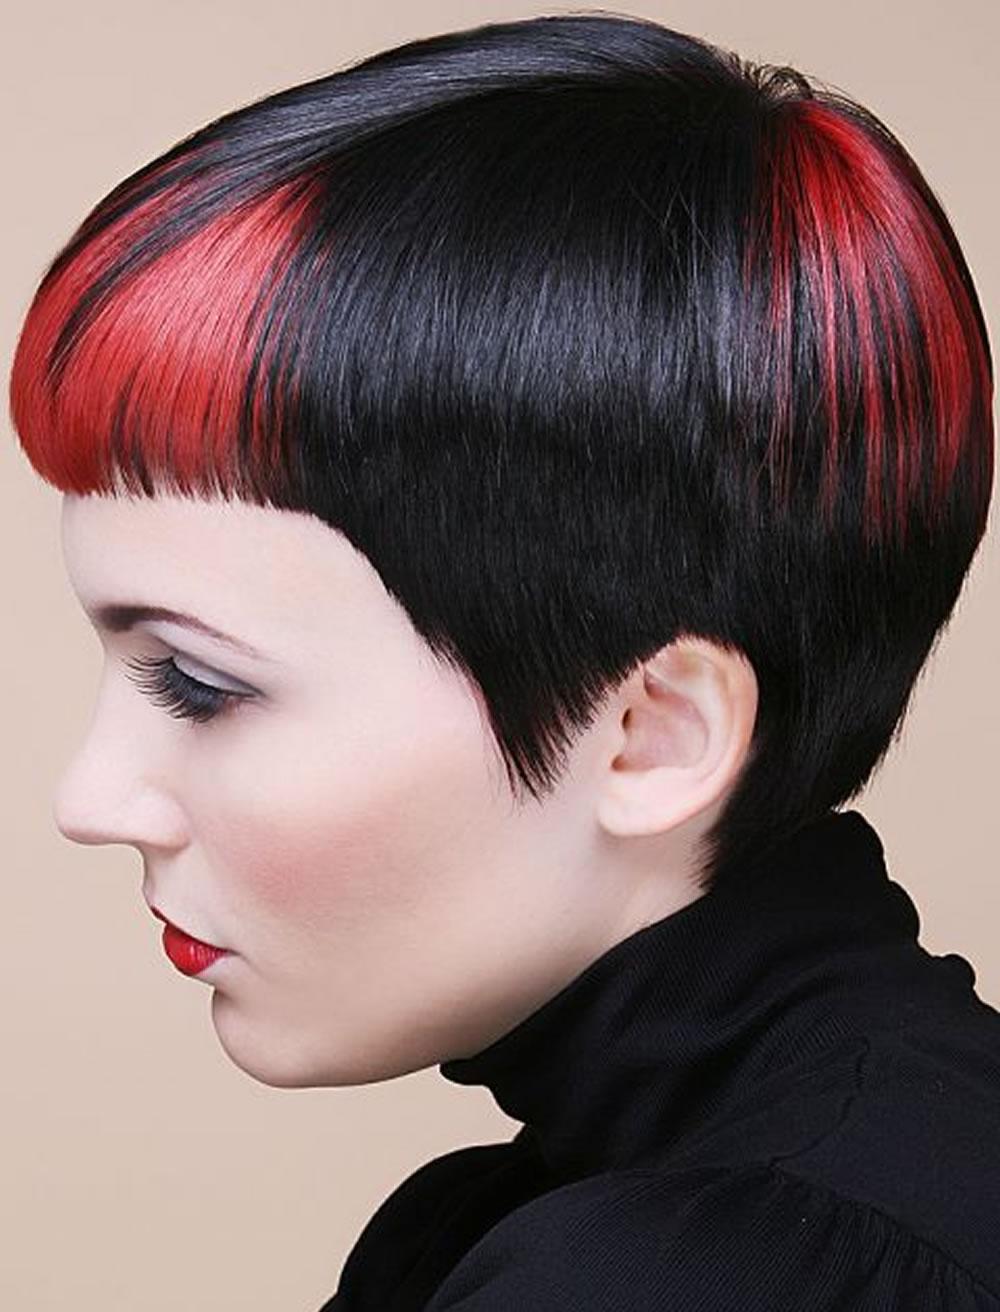 Easy Hairstyles For Short Hair 2018 Amp Pixie Hair Cuts